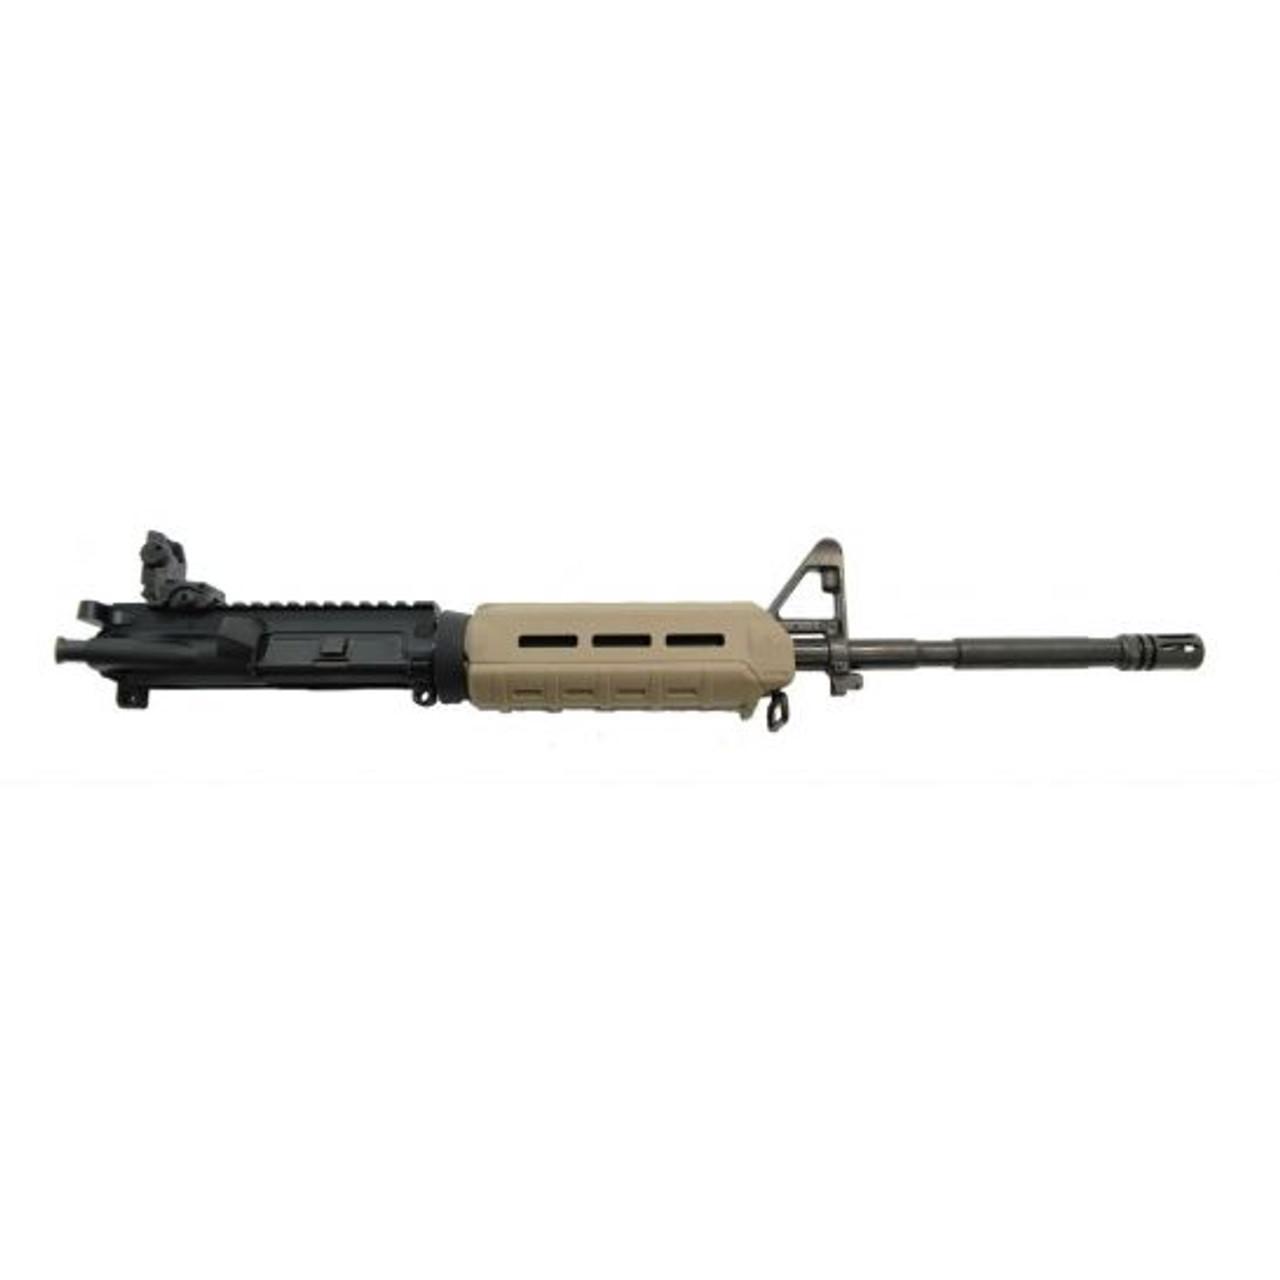 PSA Complete M4 Upper W/MBUS REAR CALIFORNIA LEGAL - .223/5.56 - FDE